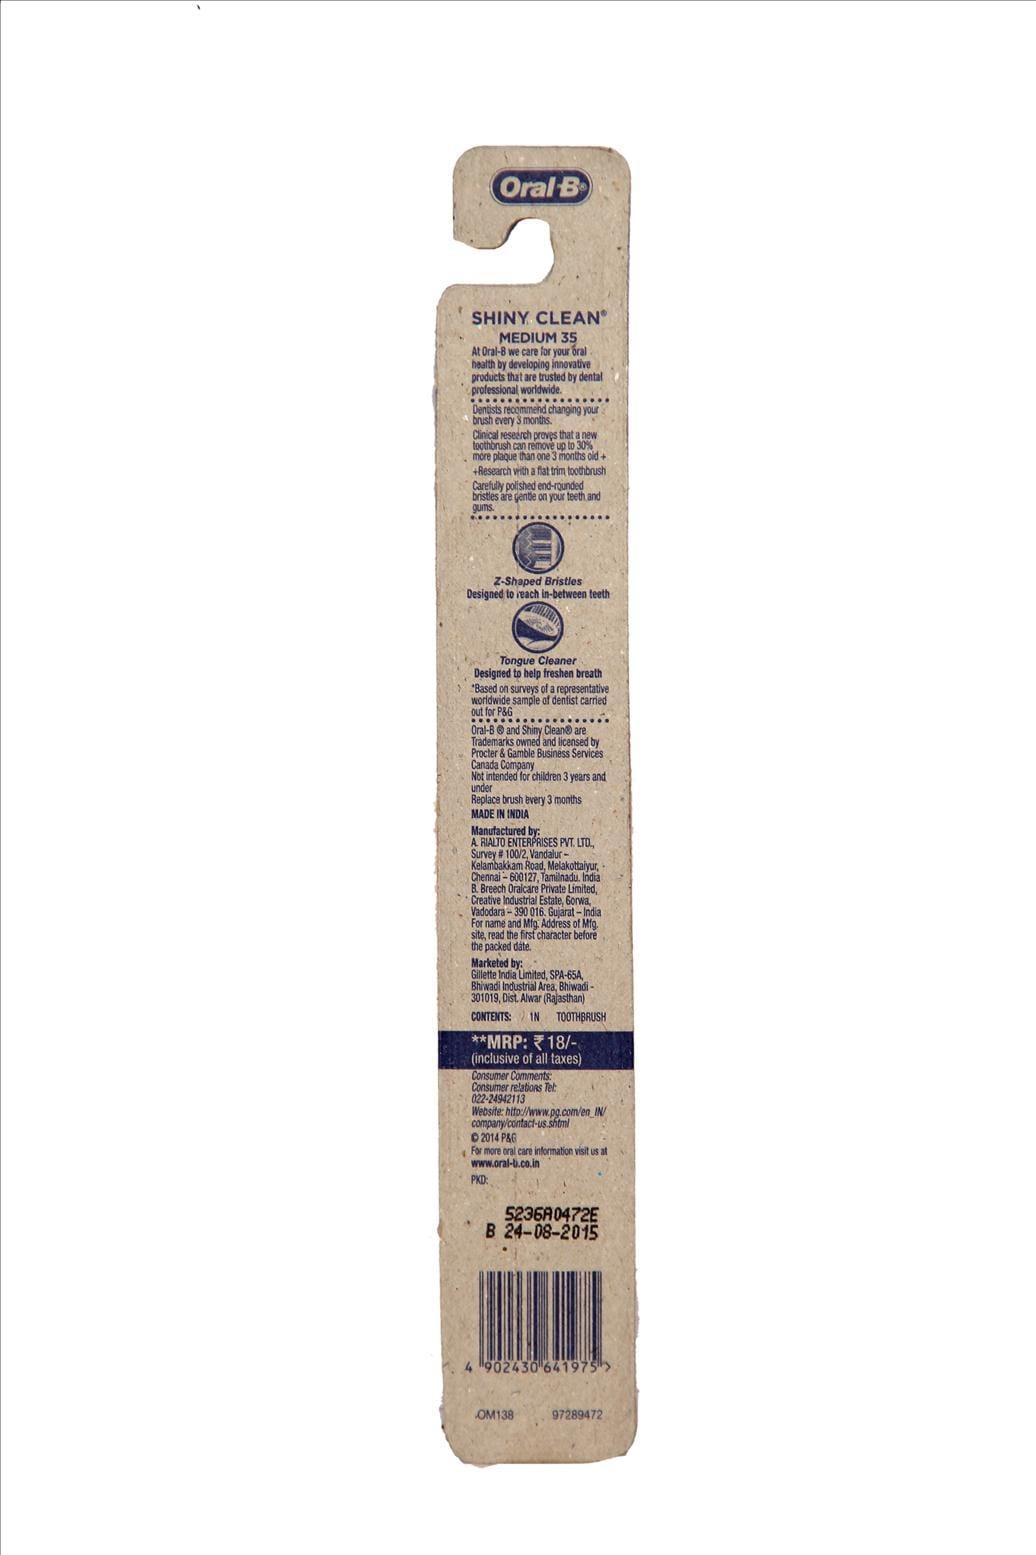 Oral-B Shiney Clean Medium Tooth Brush